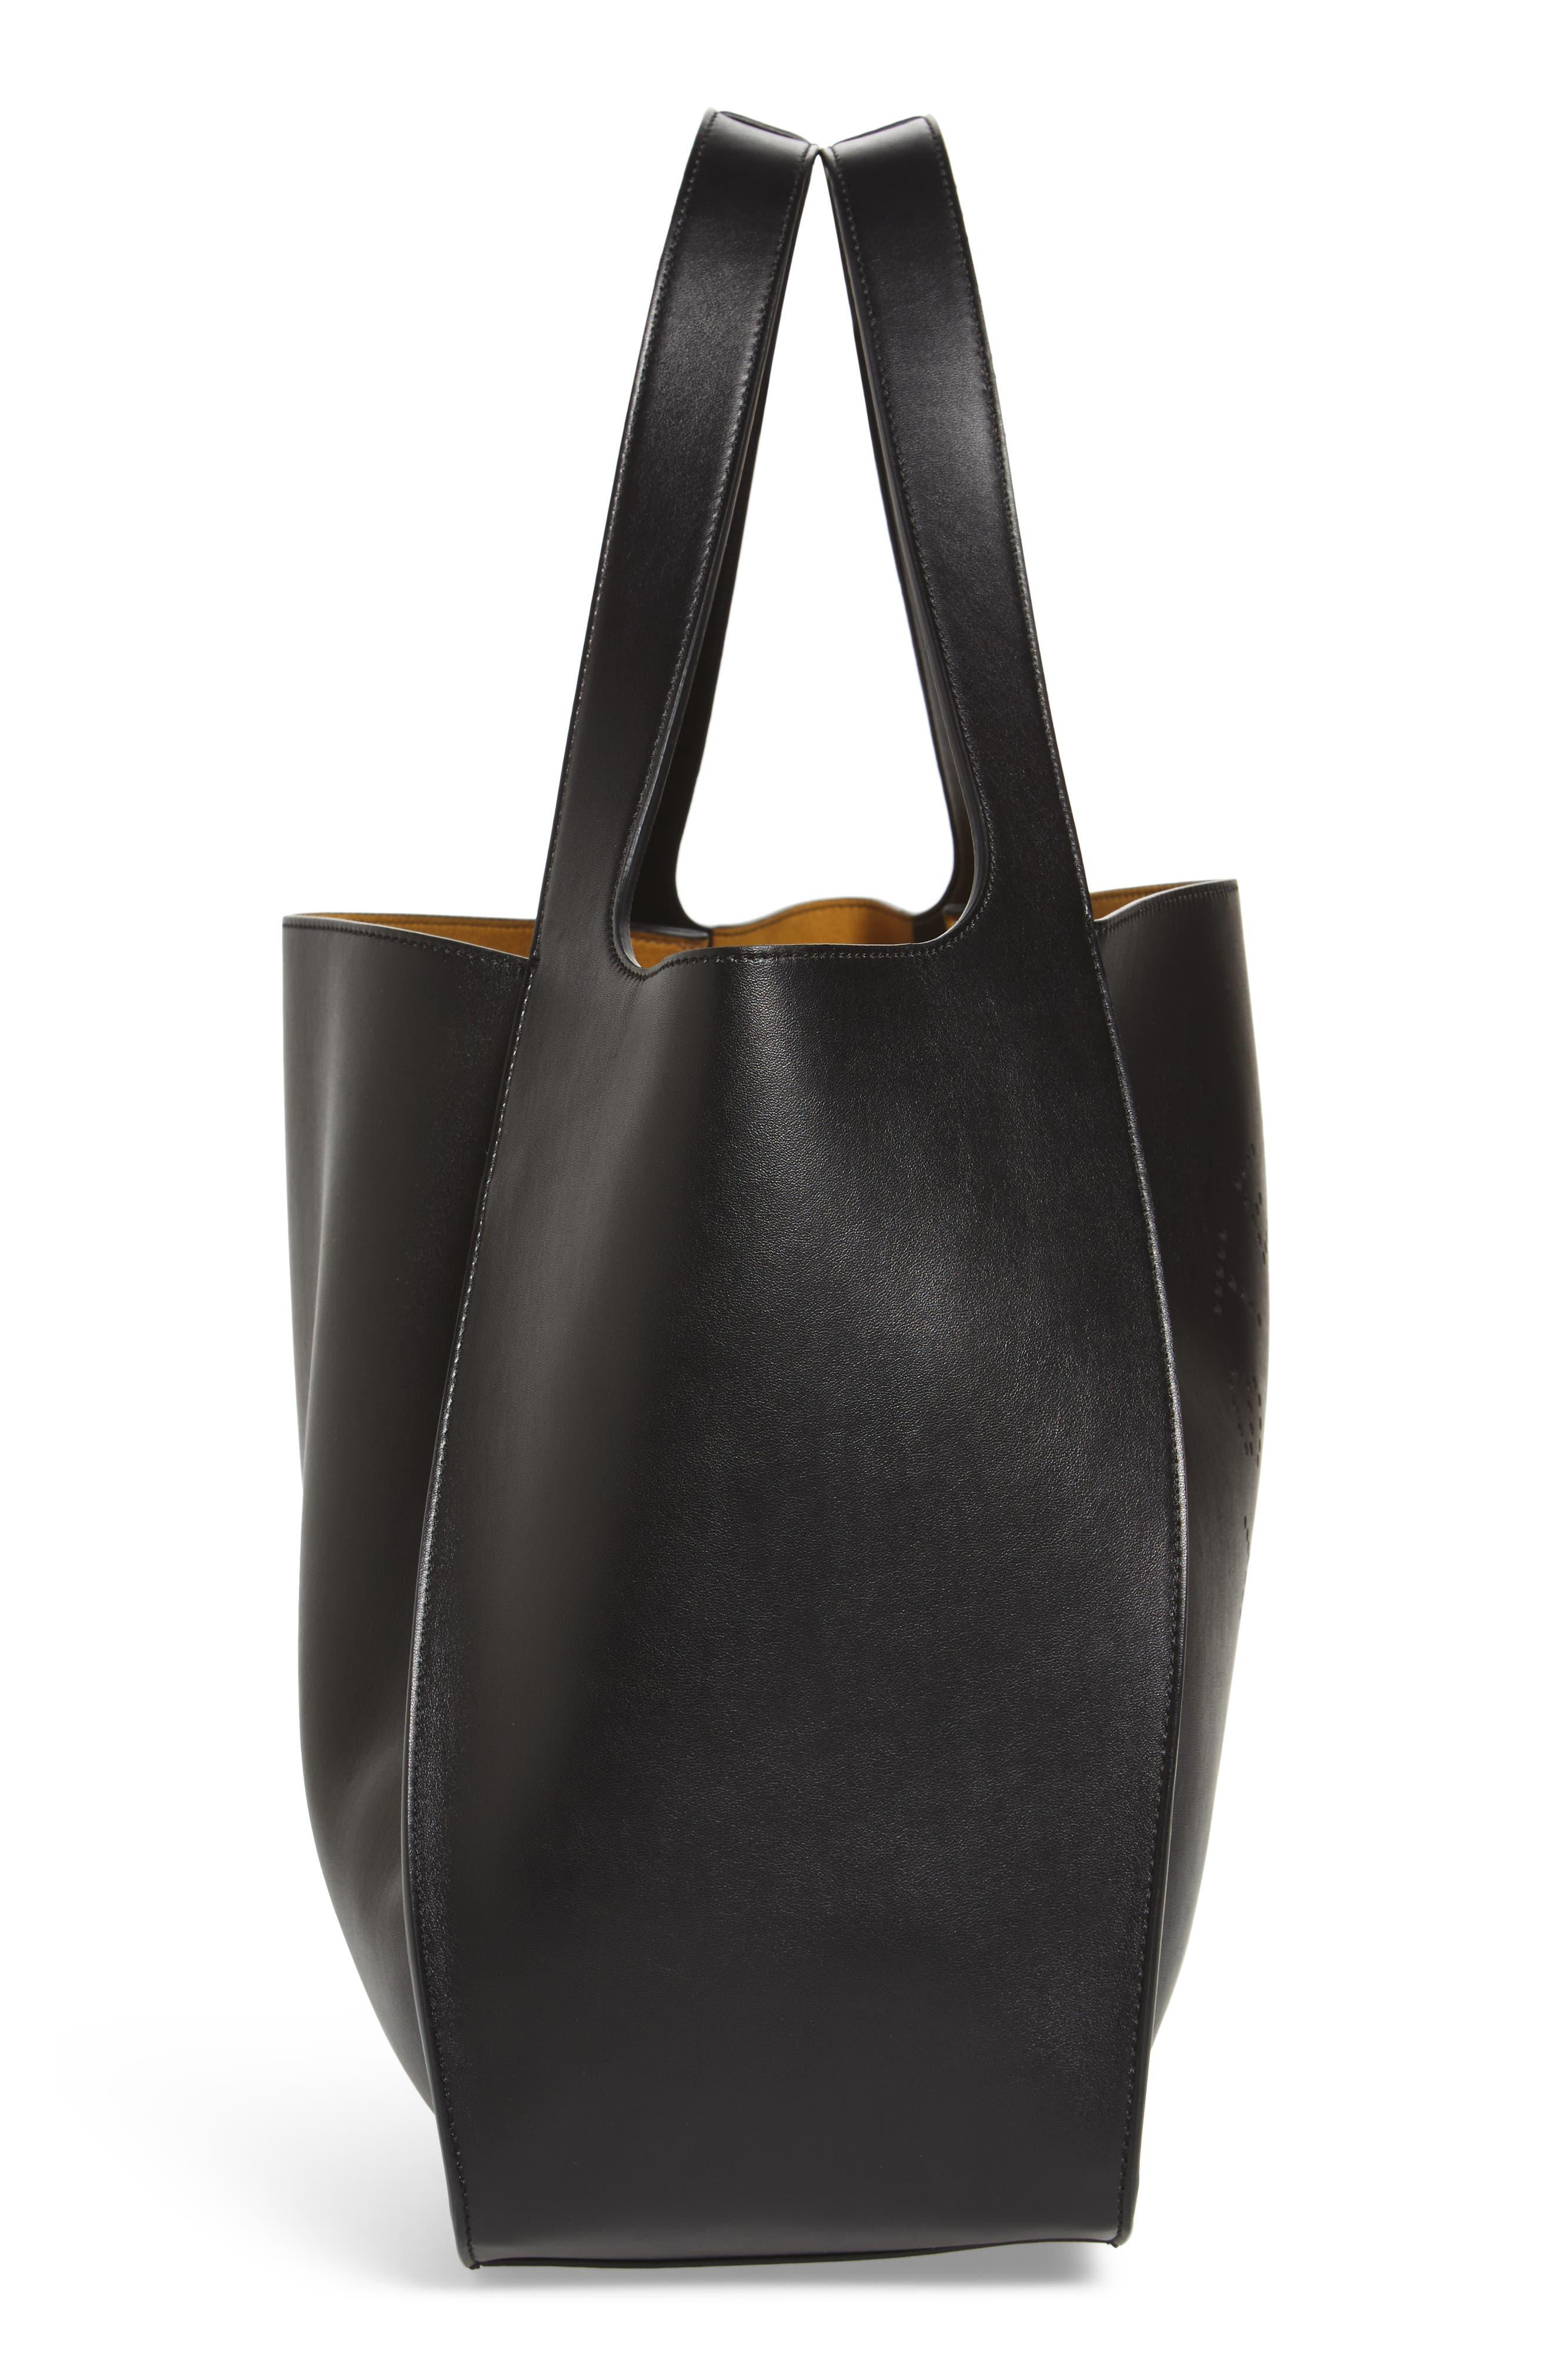 STELLA MCCARTNEY, Medium Perforated Logo Faux Leather Tote, Alternate thumbnail 5, color, BLACK